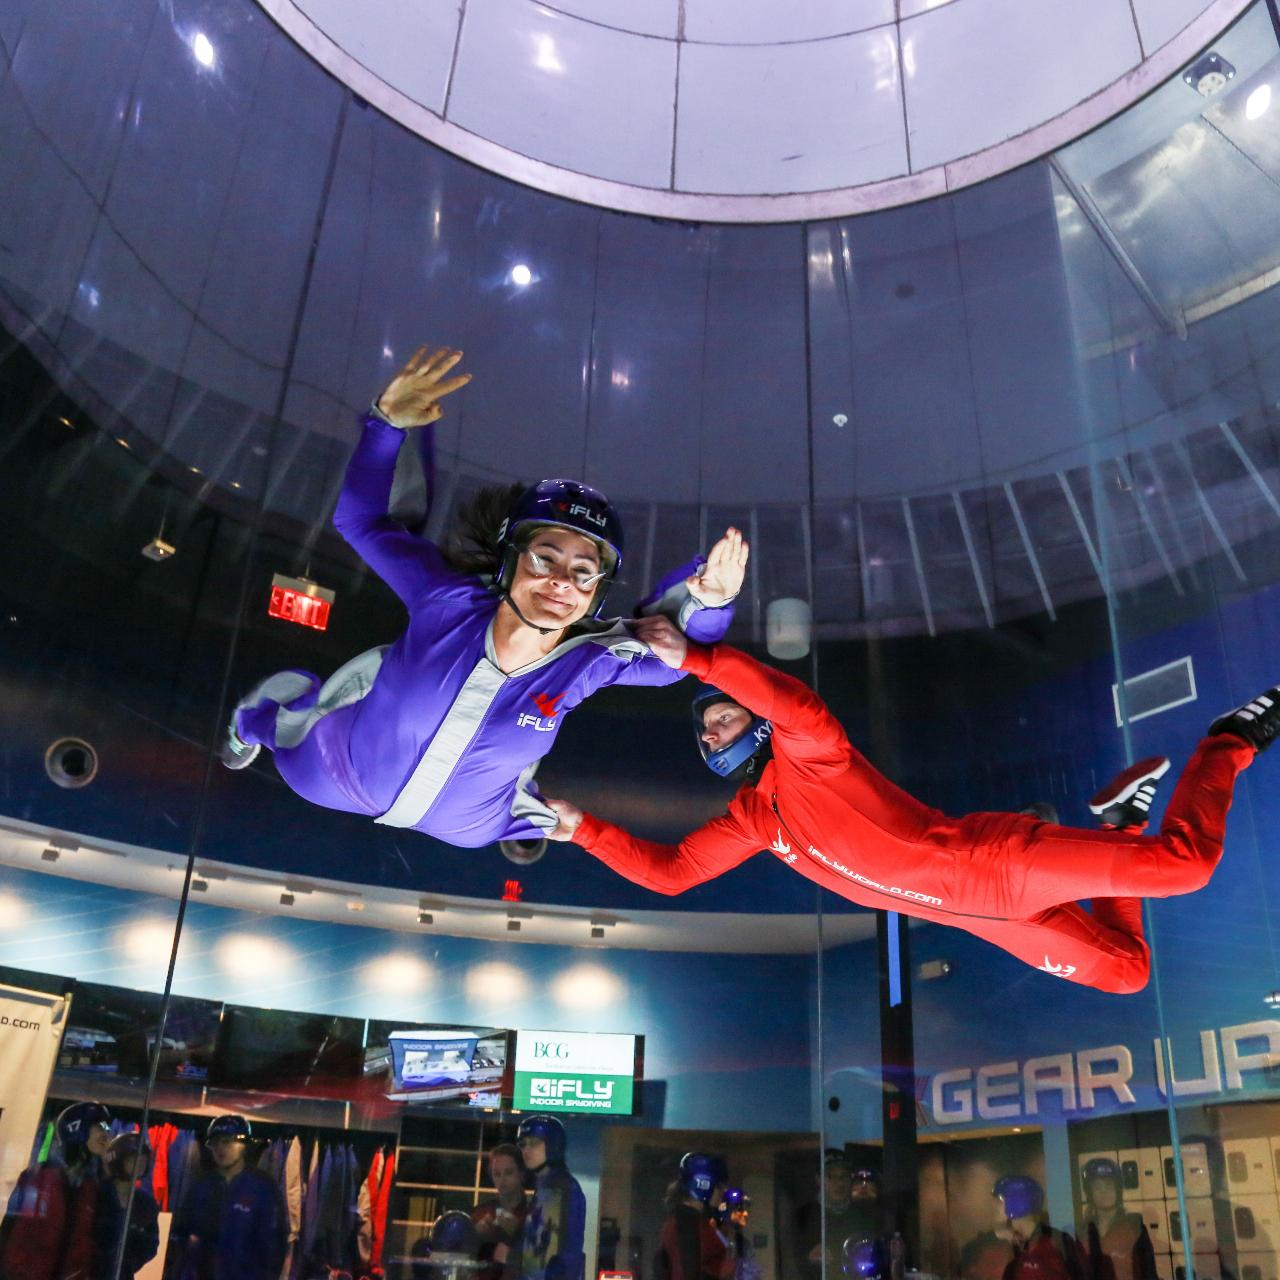 Indoor Skydive in Atlanta